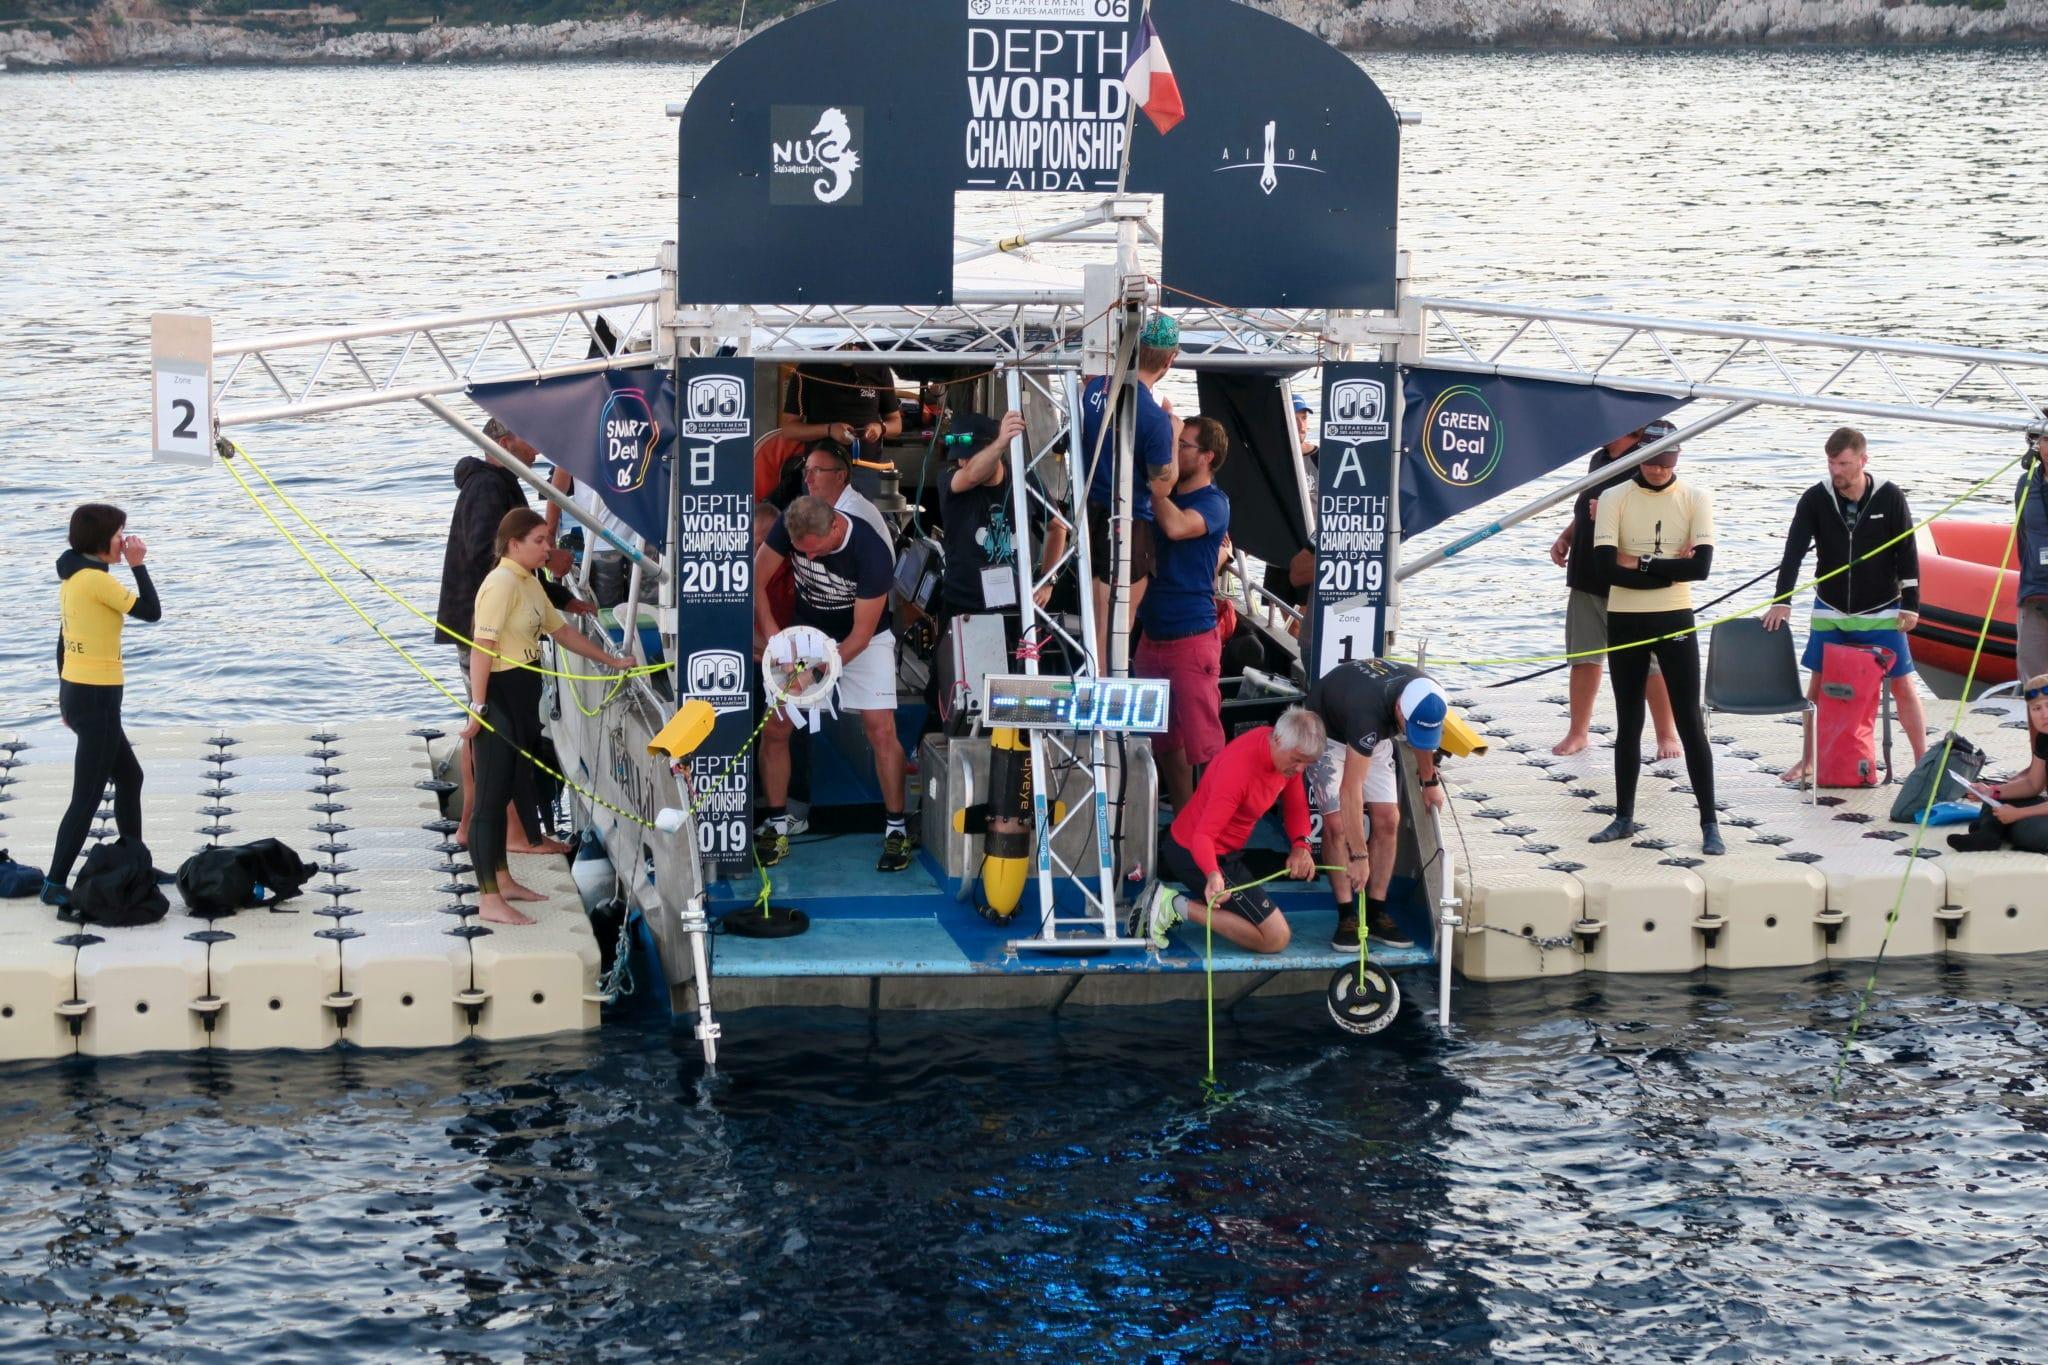 AIDA Depth world championships 2019 Villefranche